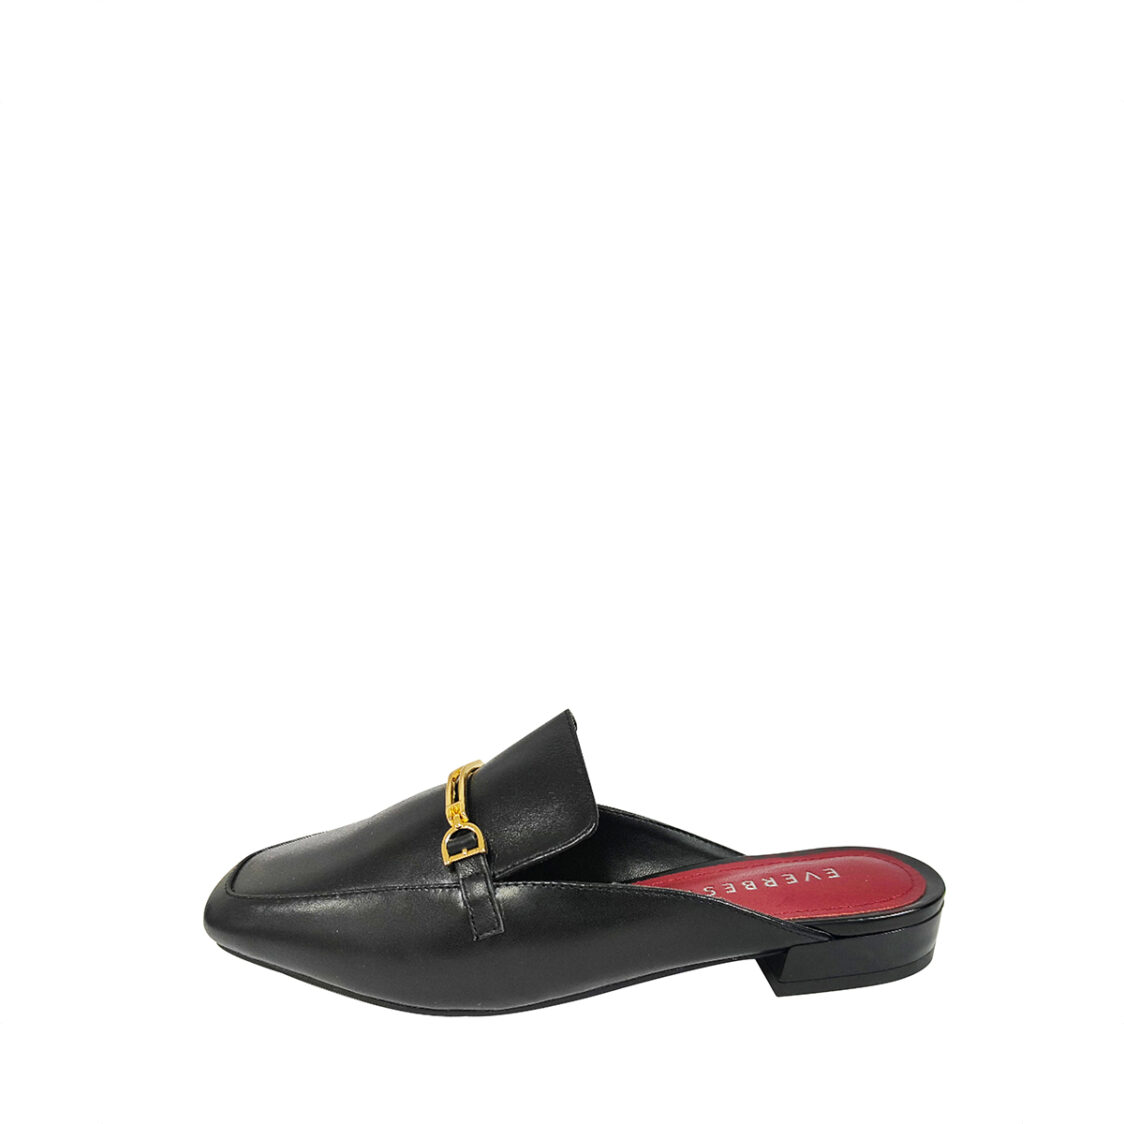 Everbest Comfort Ladies Slip on Mules in Black